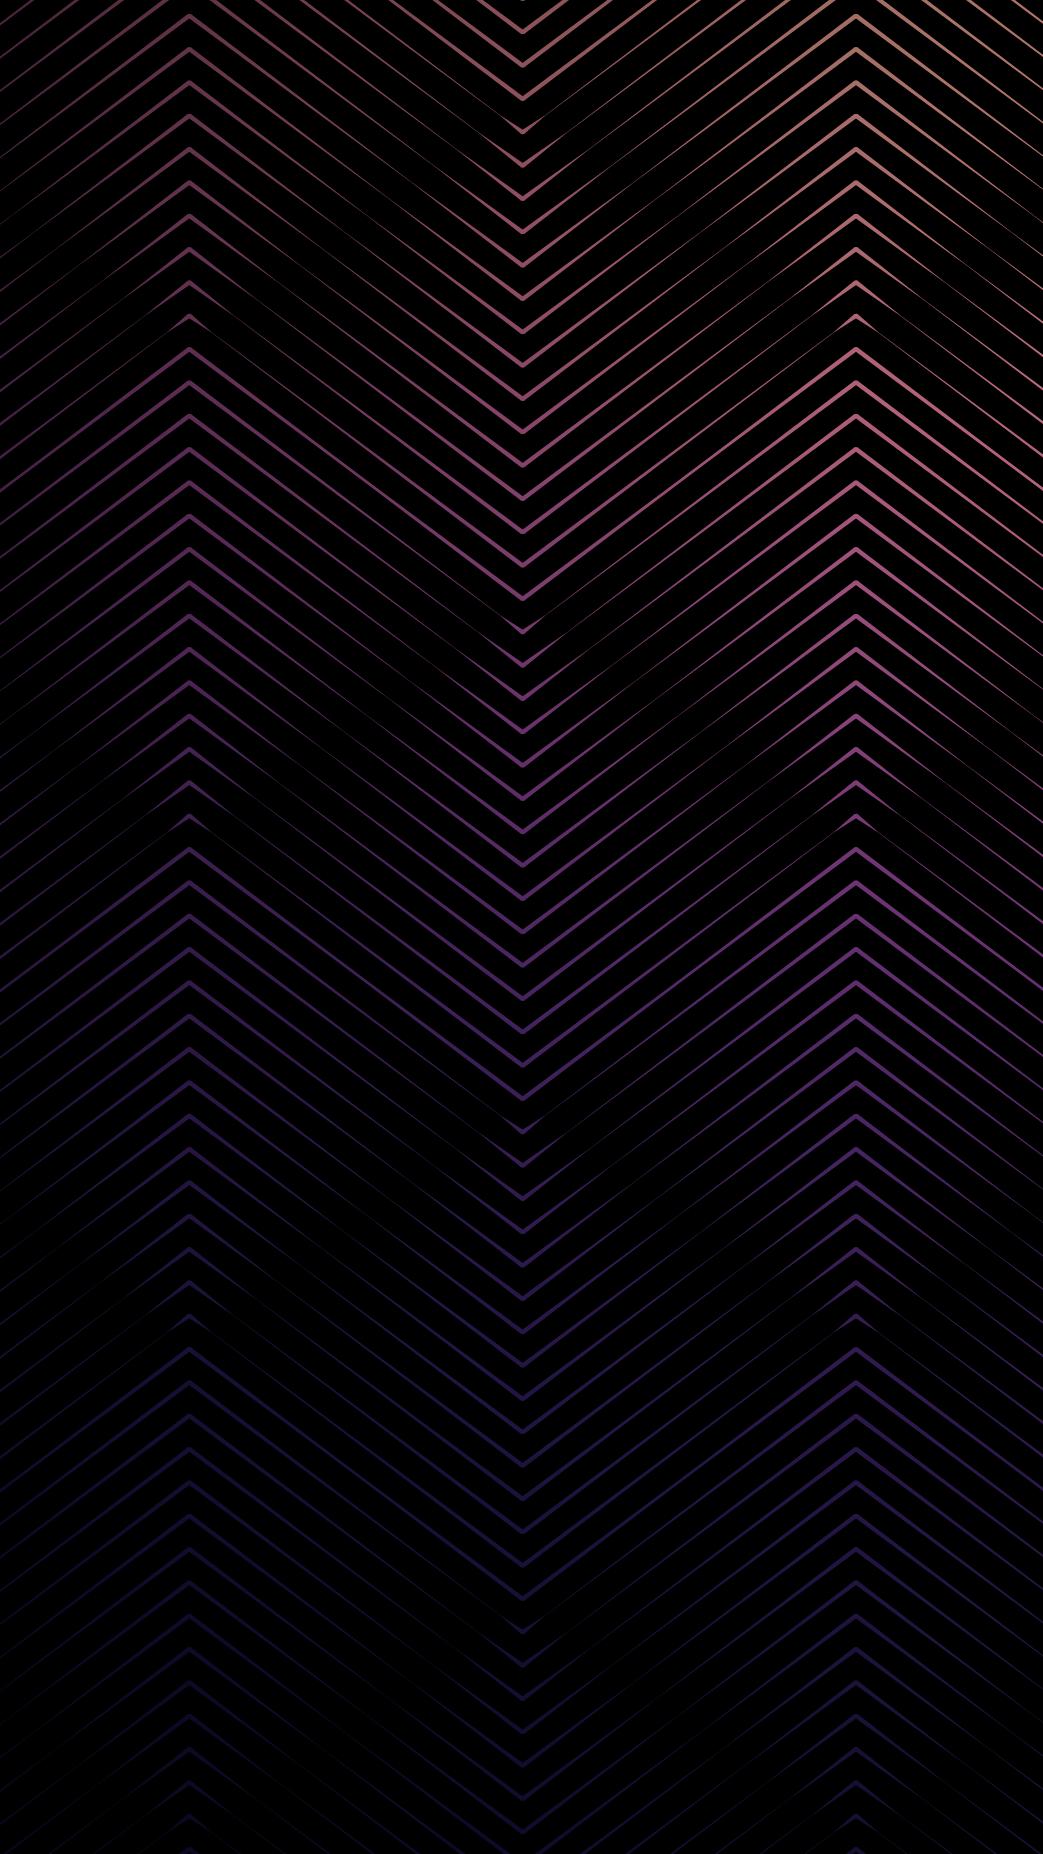 Dark Aesthetic Wallpaper Wallpapers For Tech Abstract Wallpaper